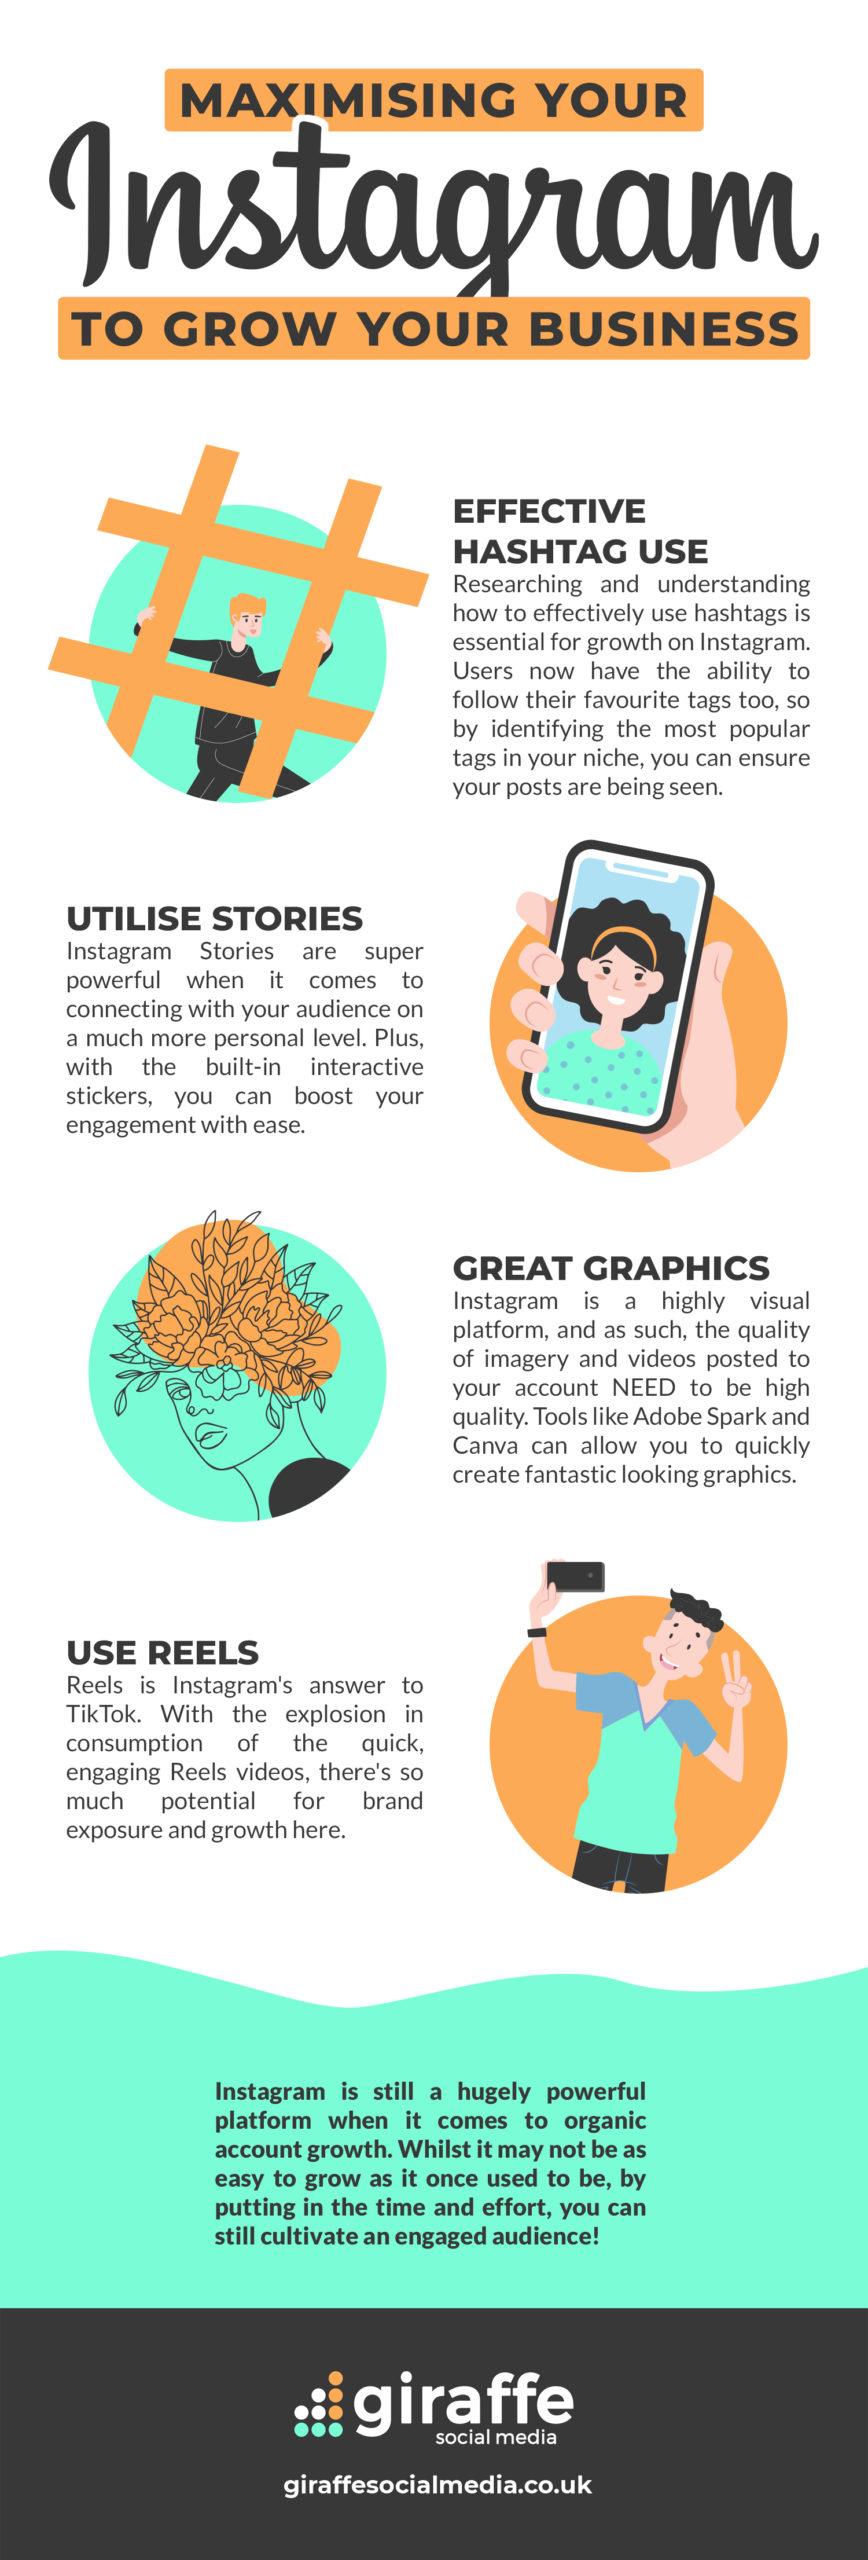 Maximize Instagram to Grow business